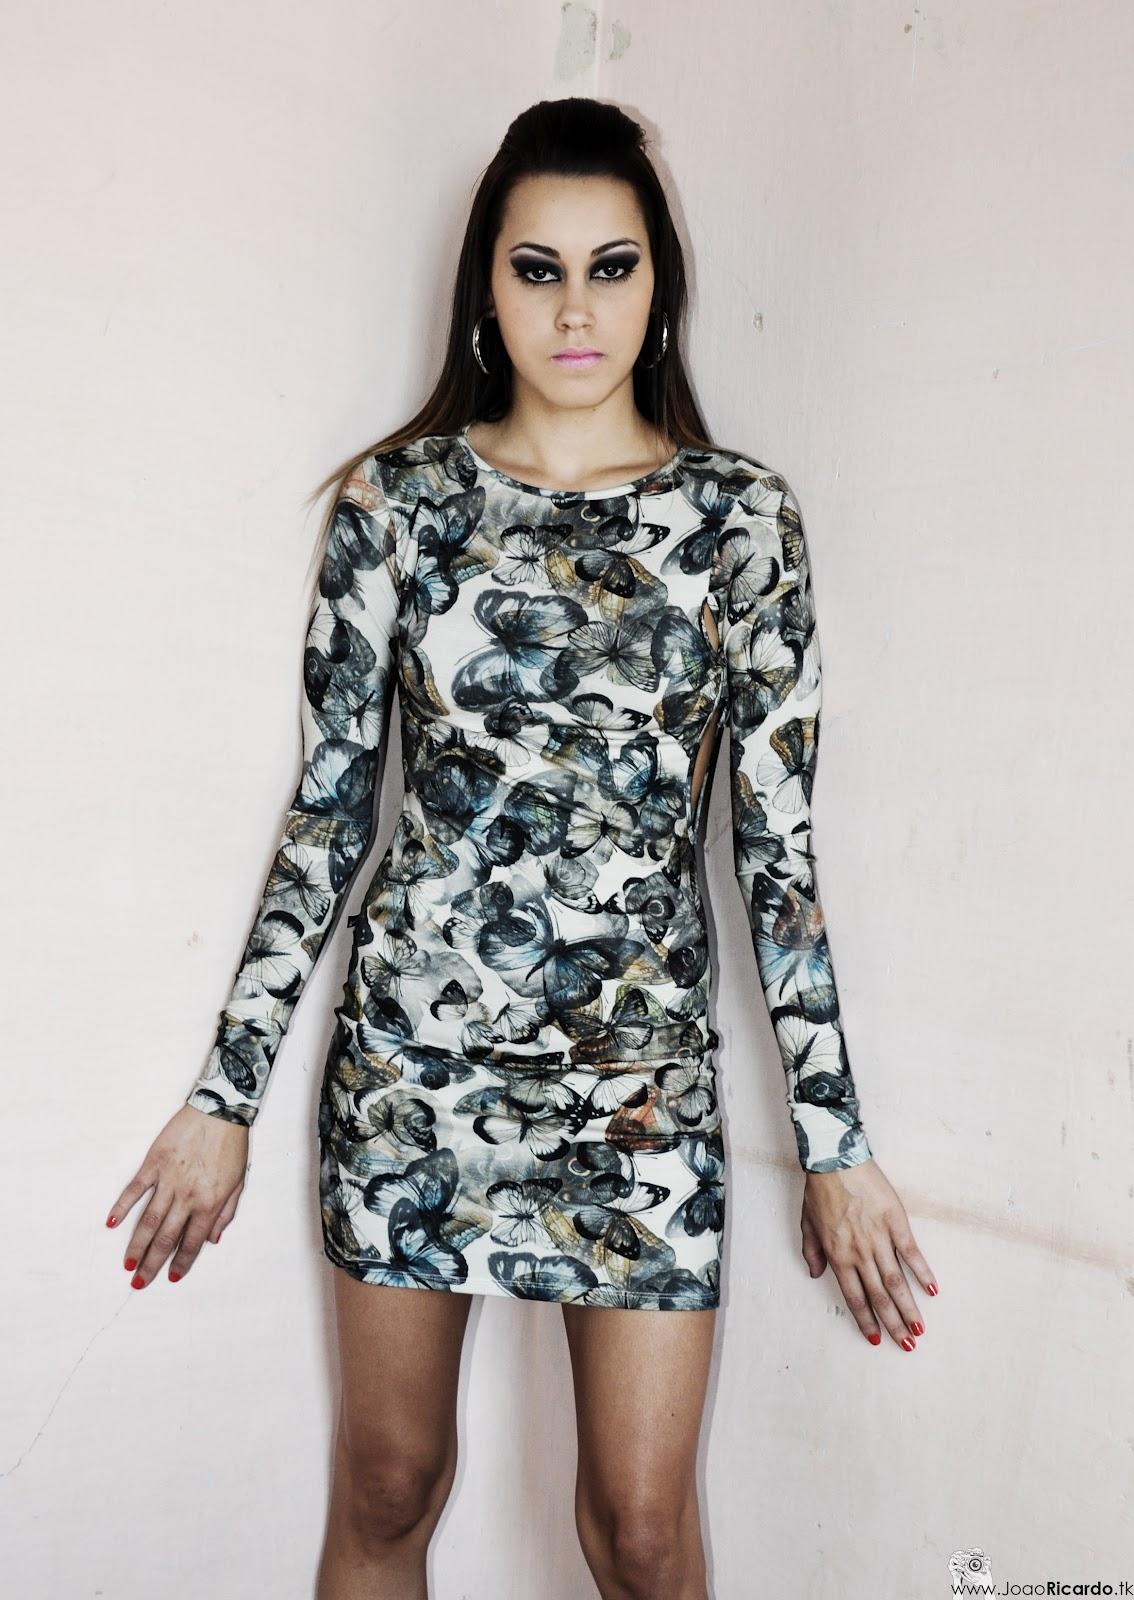 http://4.bp.blogspot.com/-hs_lN45vPpQ/UCppxzsIuZI/AAAAAAAAAtA/oKfrvxXAhWg/s1600/Heroica+Fashion+(52).JPG